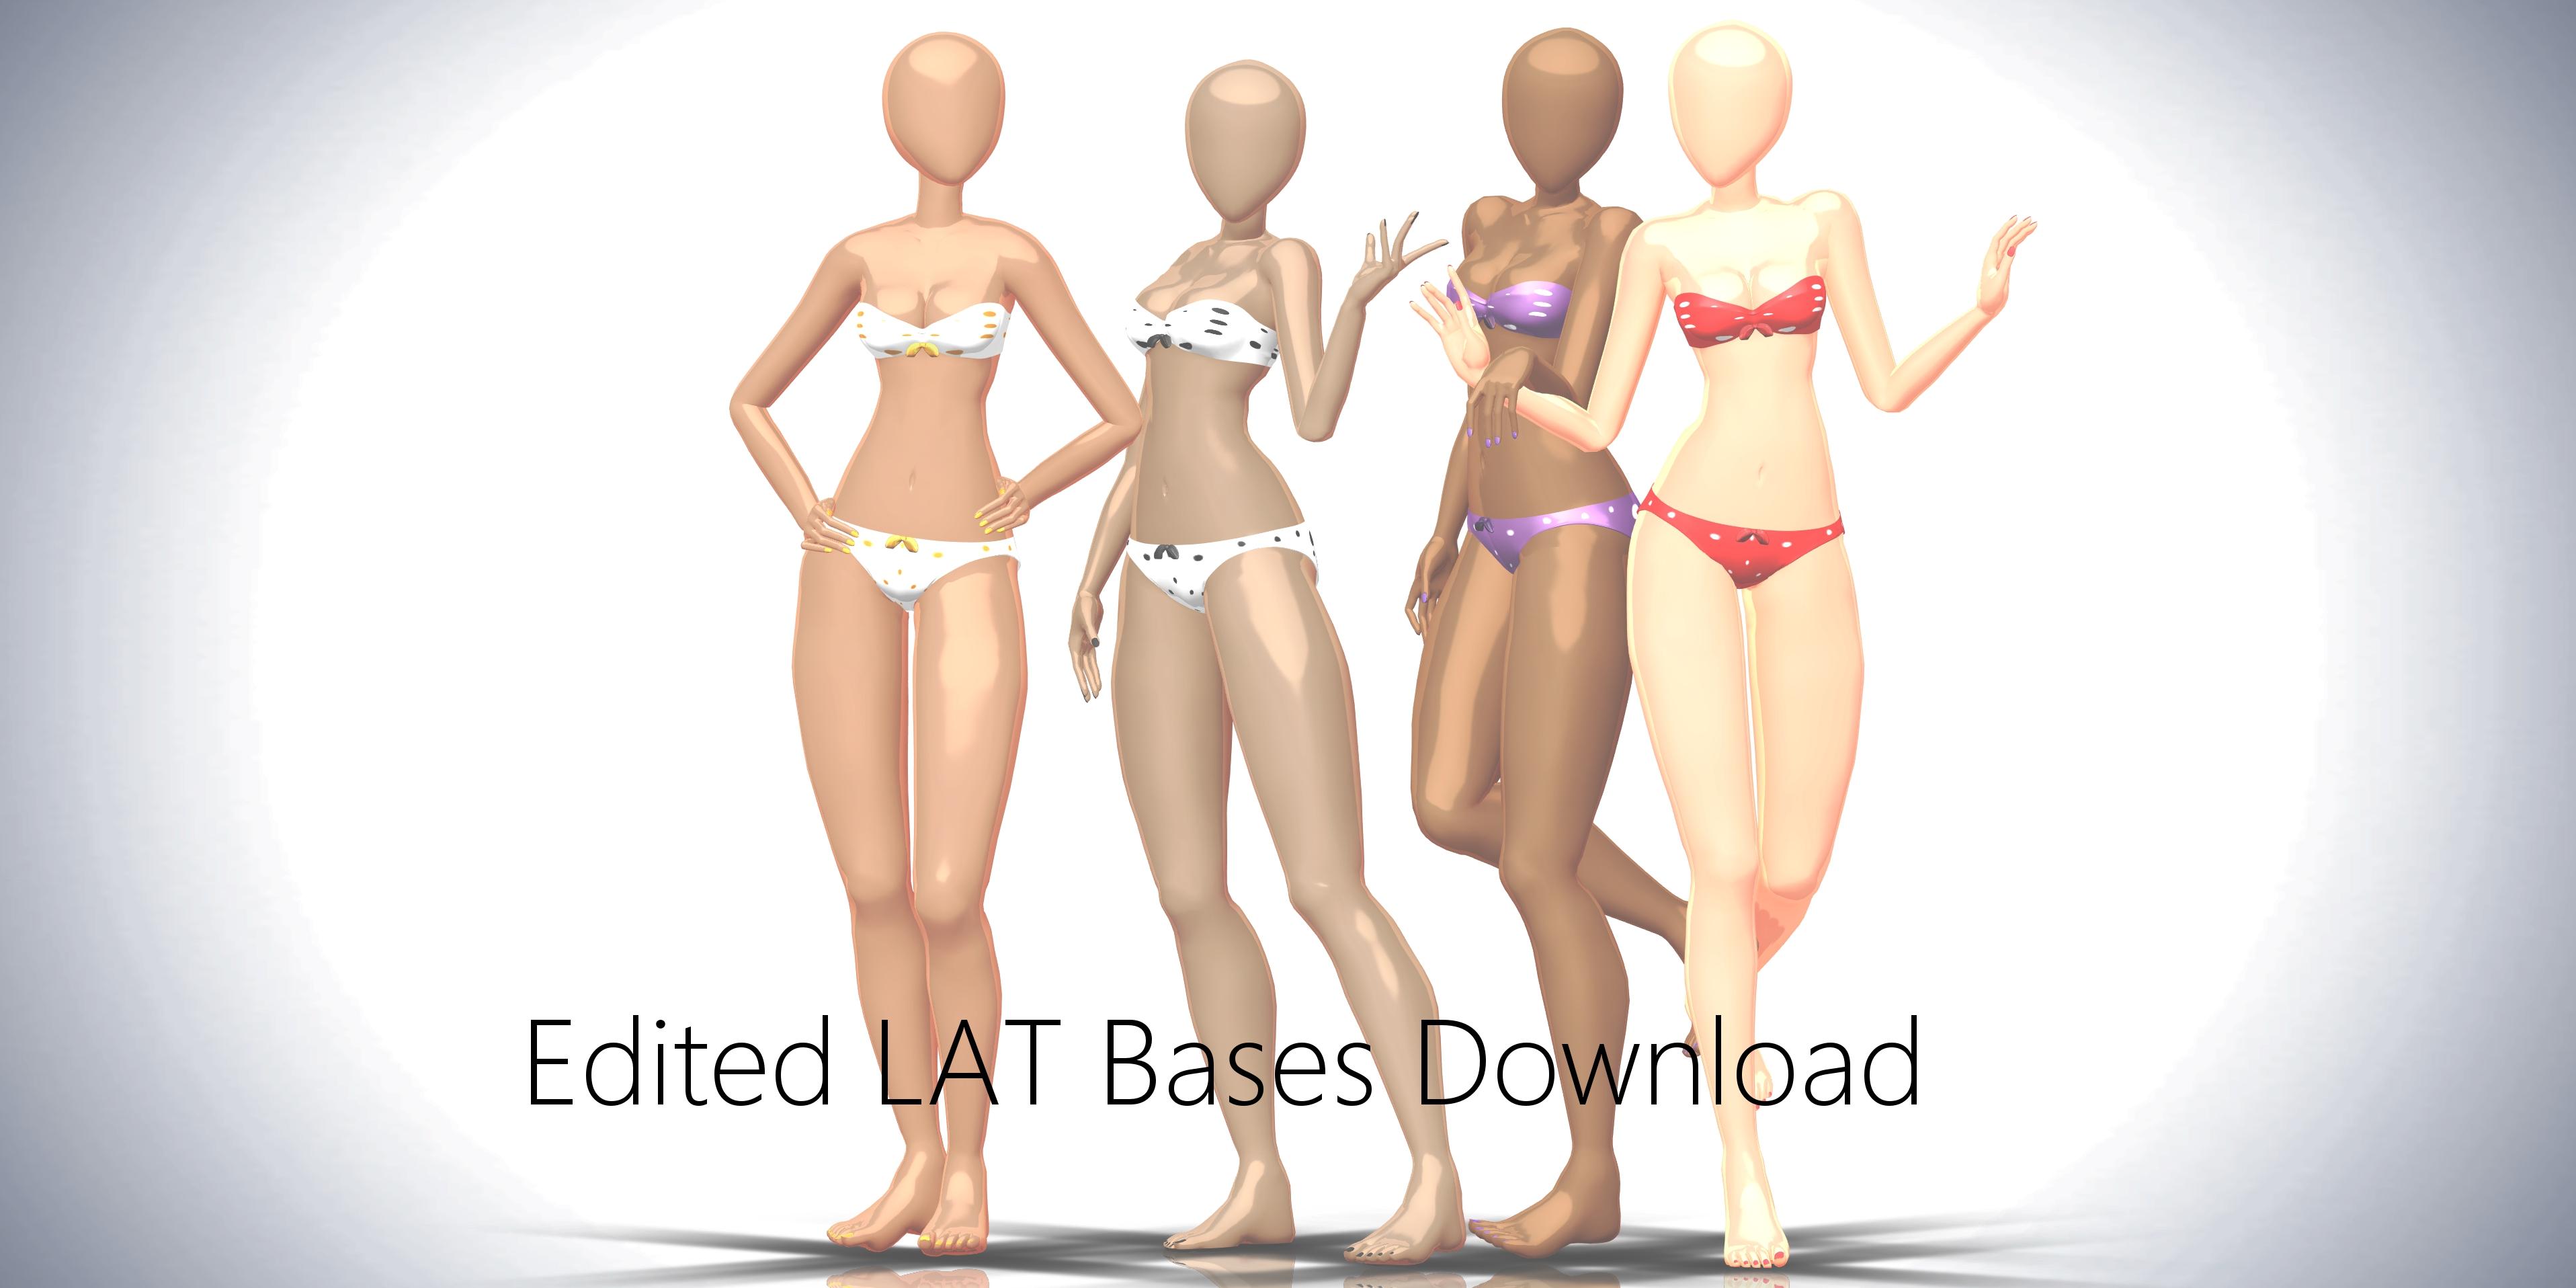 Edited LAT base- Download by MichiKairin